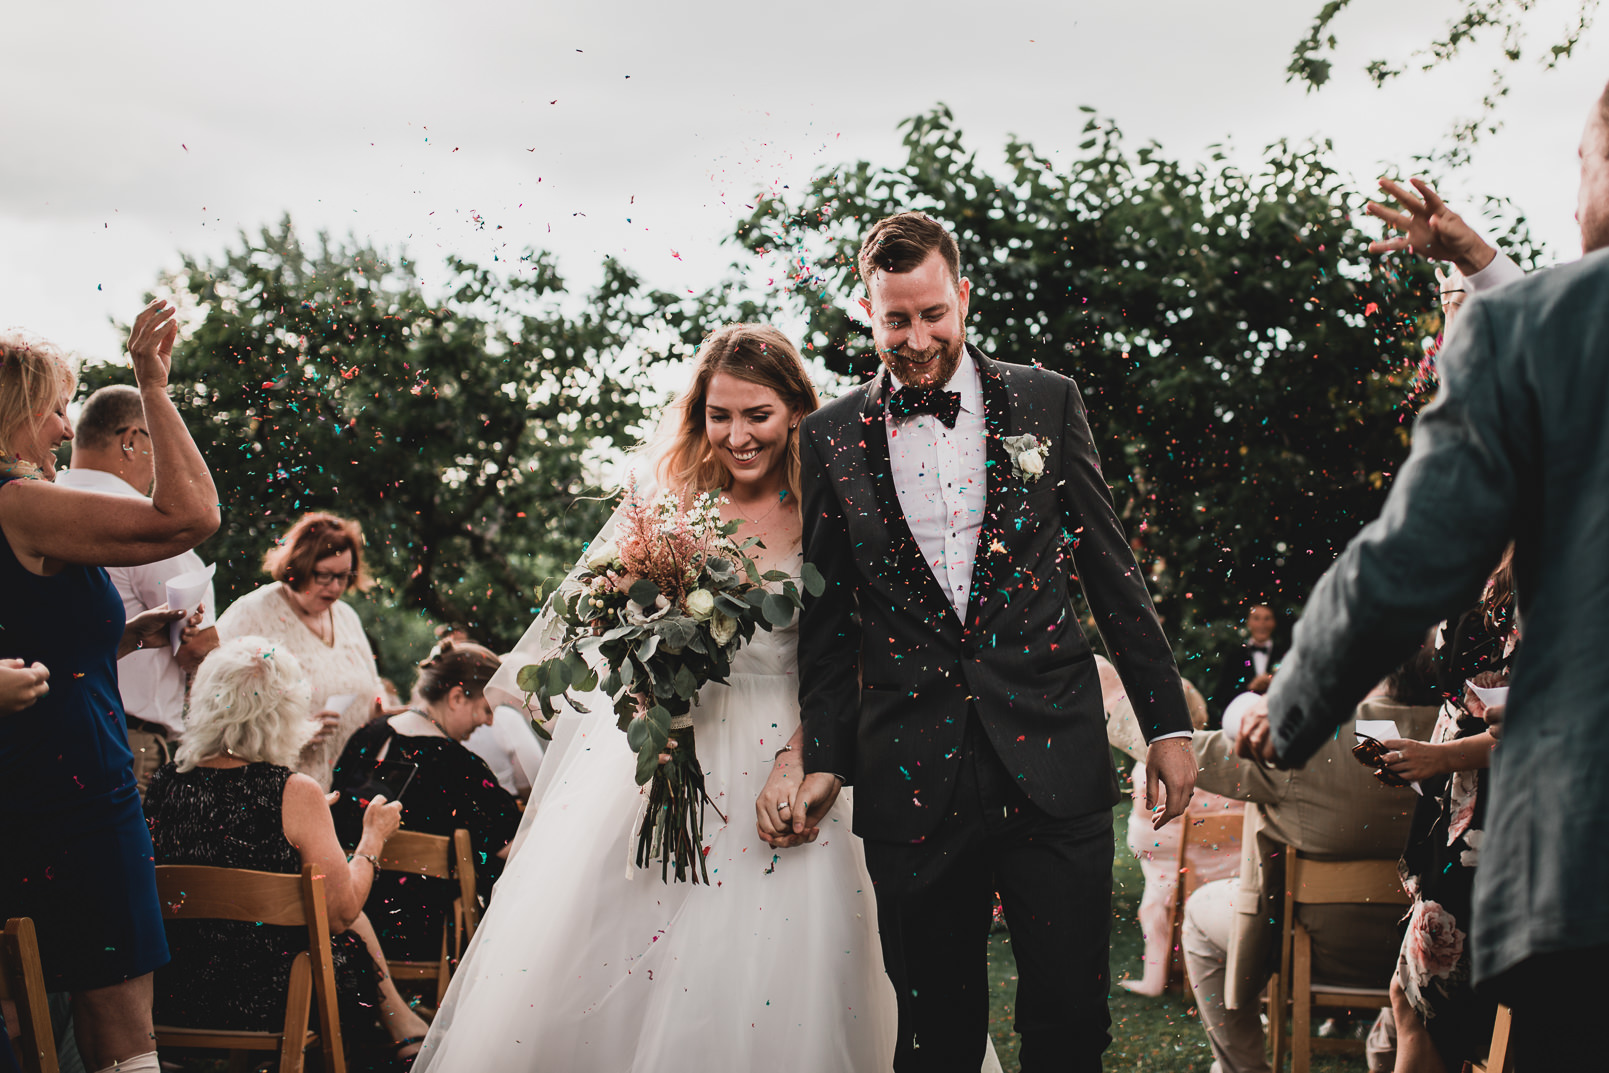 012-Jonathan-Kuhn-Photography-Wedding-_mini.jpg